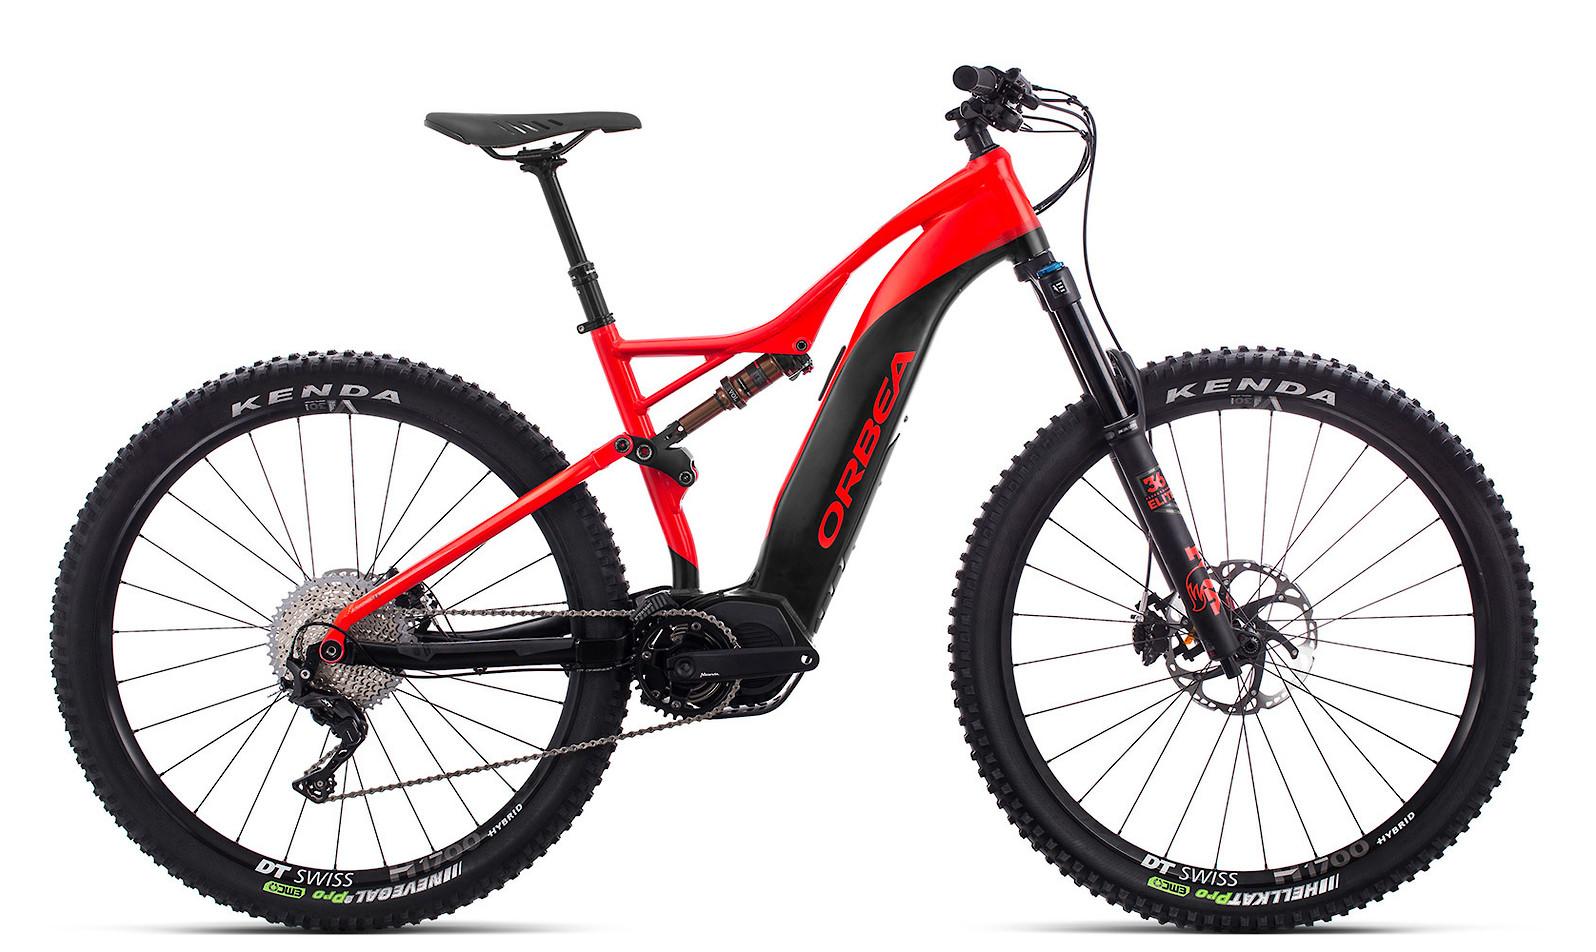 2019 Orbea Wild FS 150 20 29S E-Bike